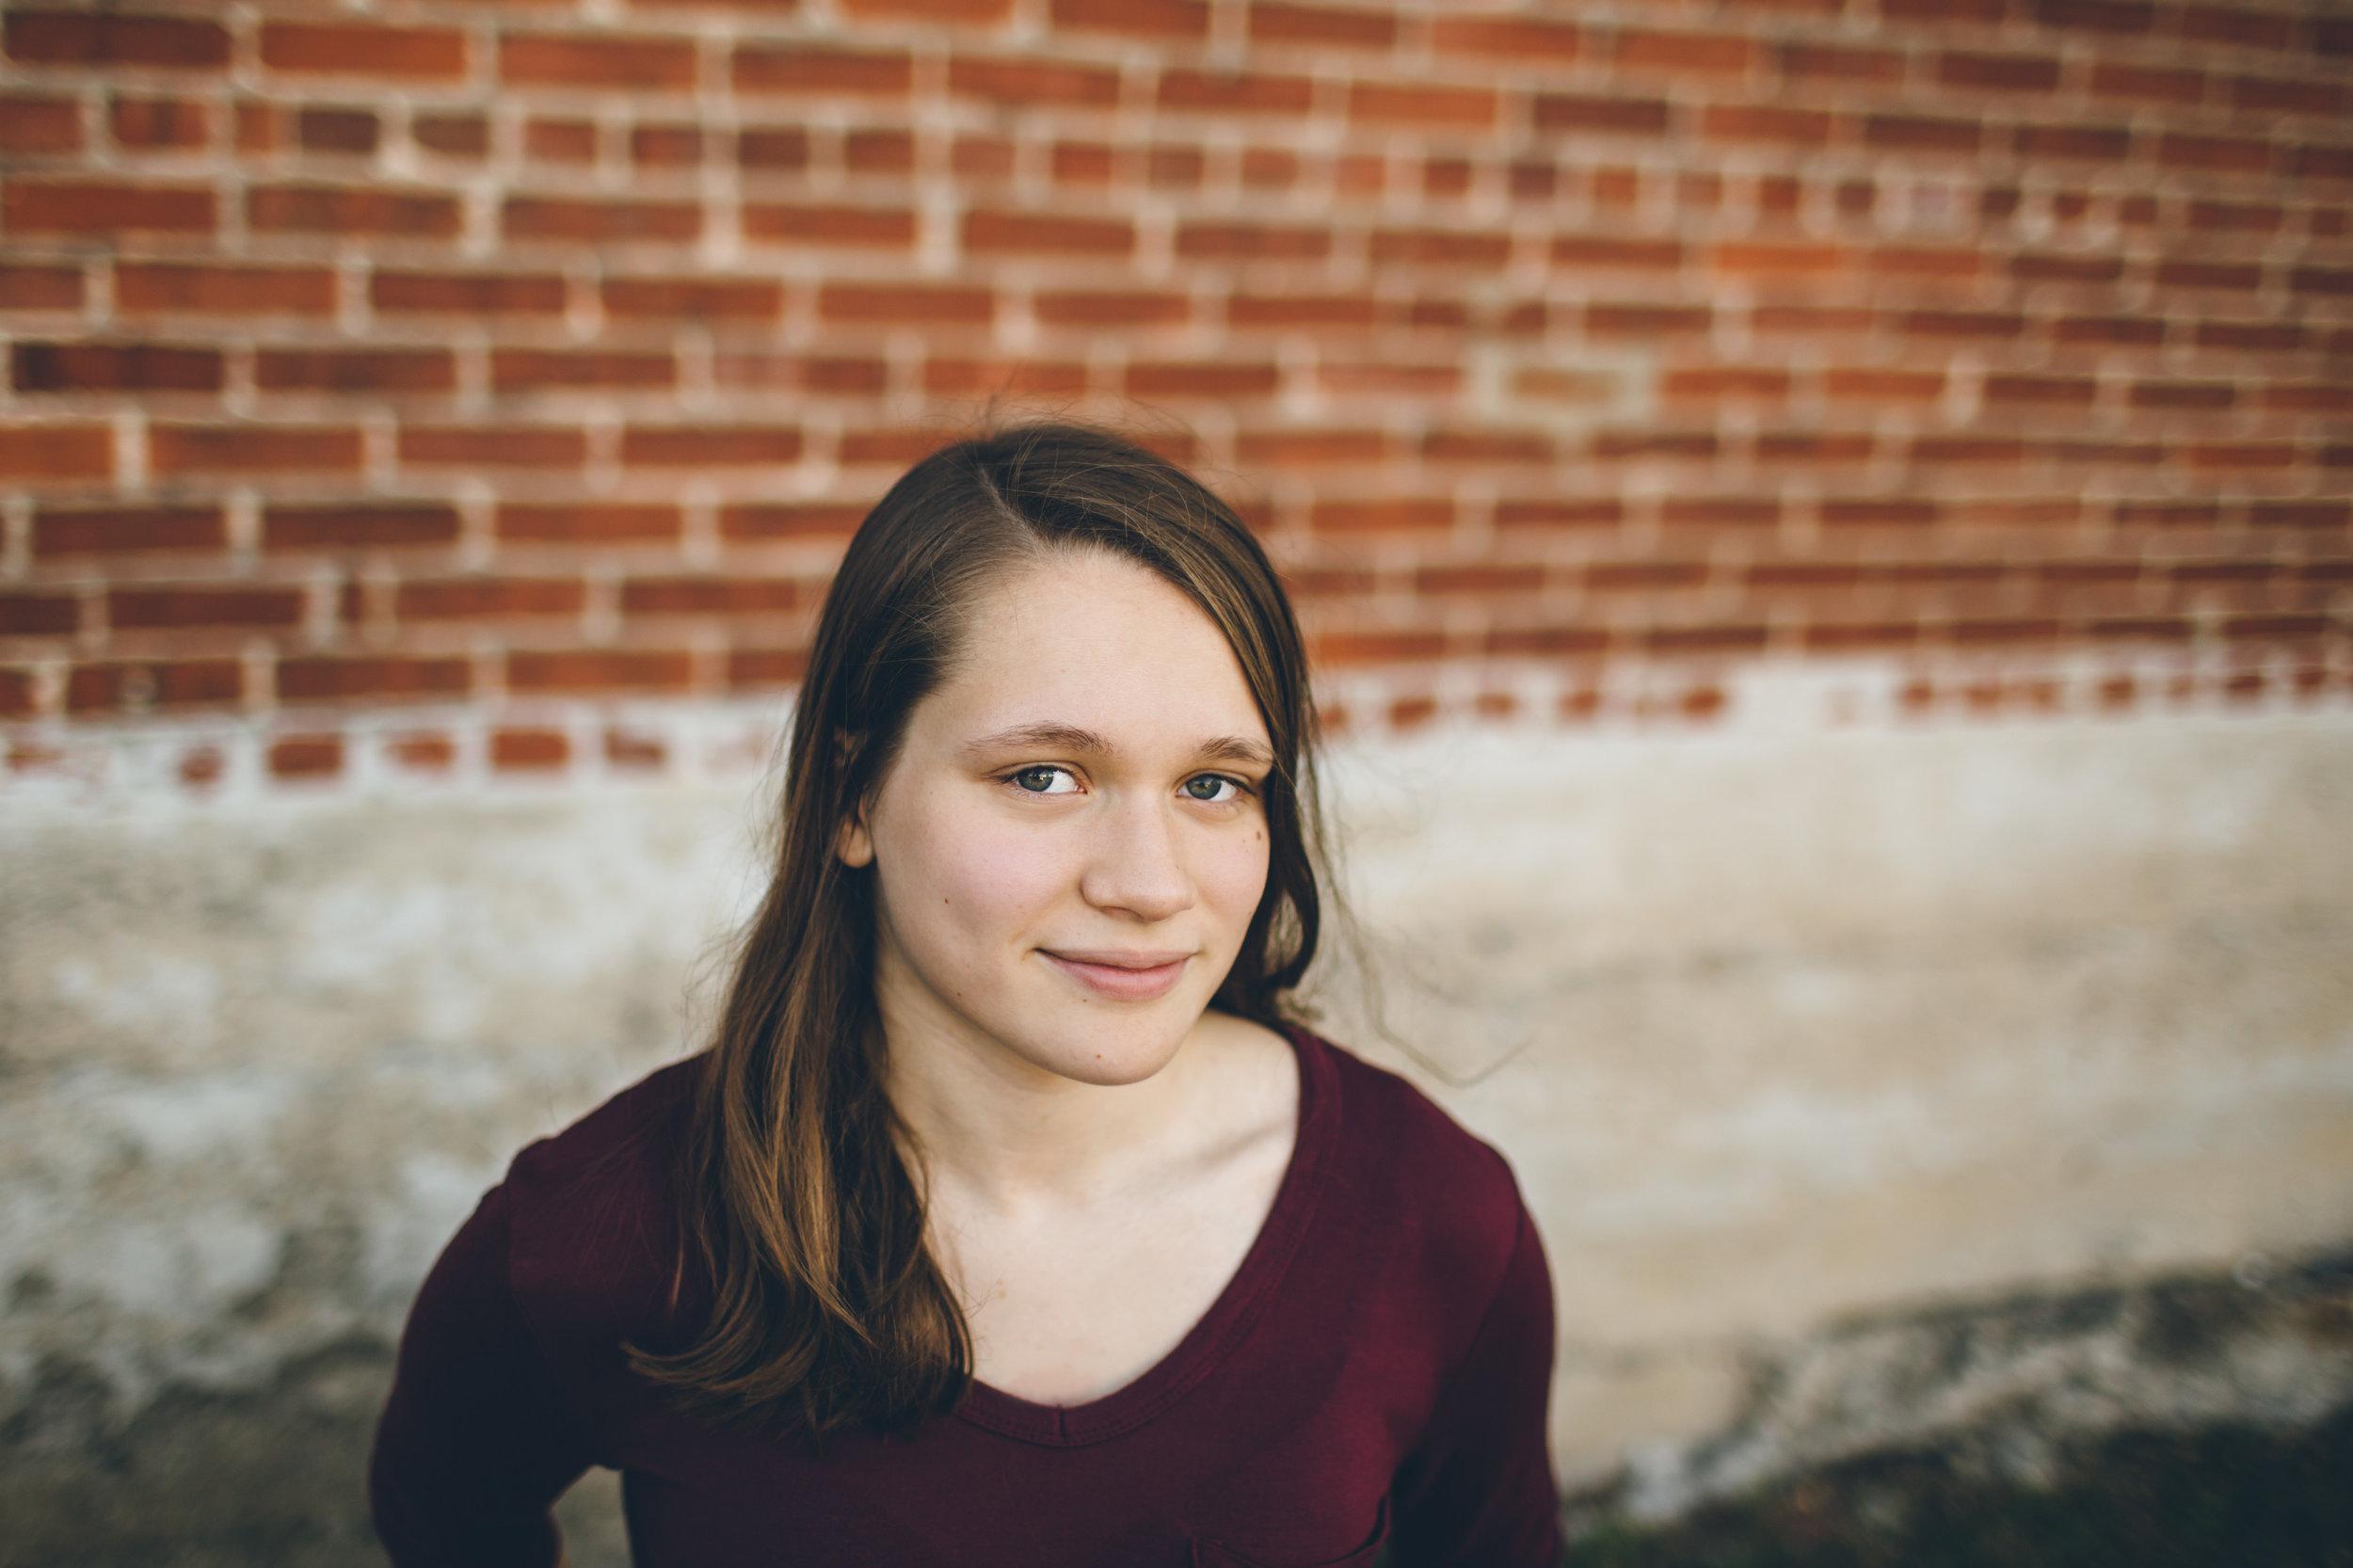 Julie_Senior Portraits-5.jpg